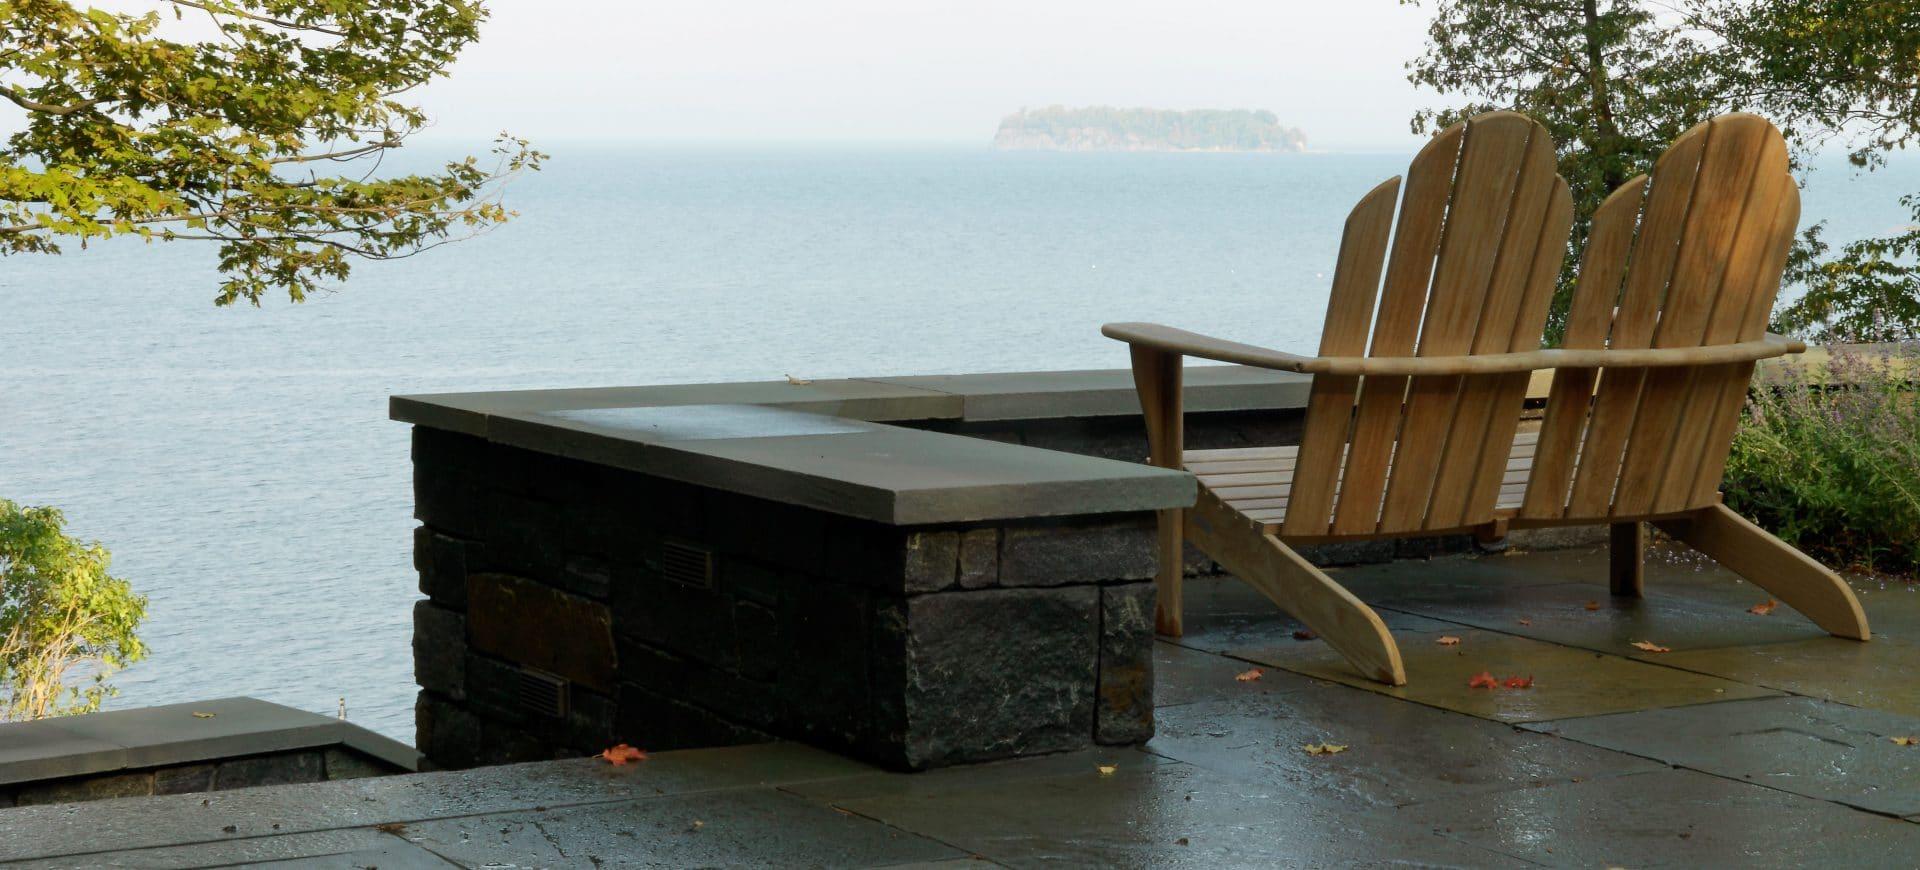 Design & Build Services - di Stefano Landscaping